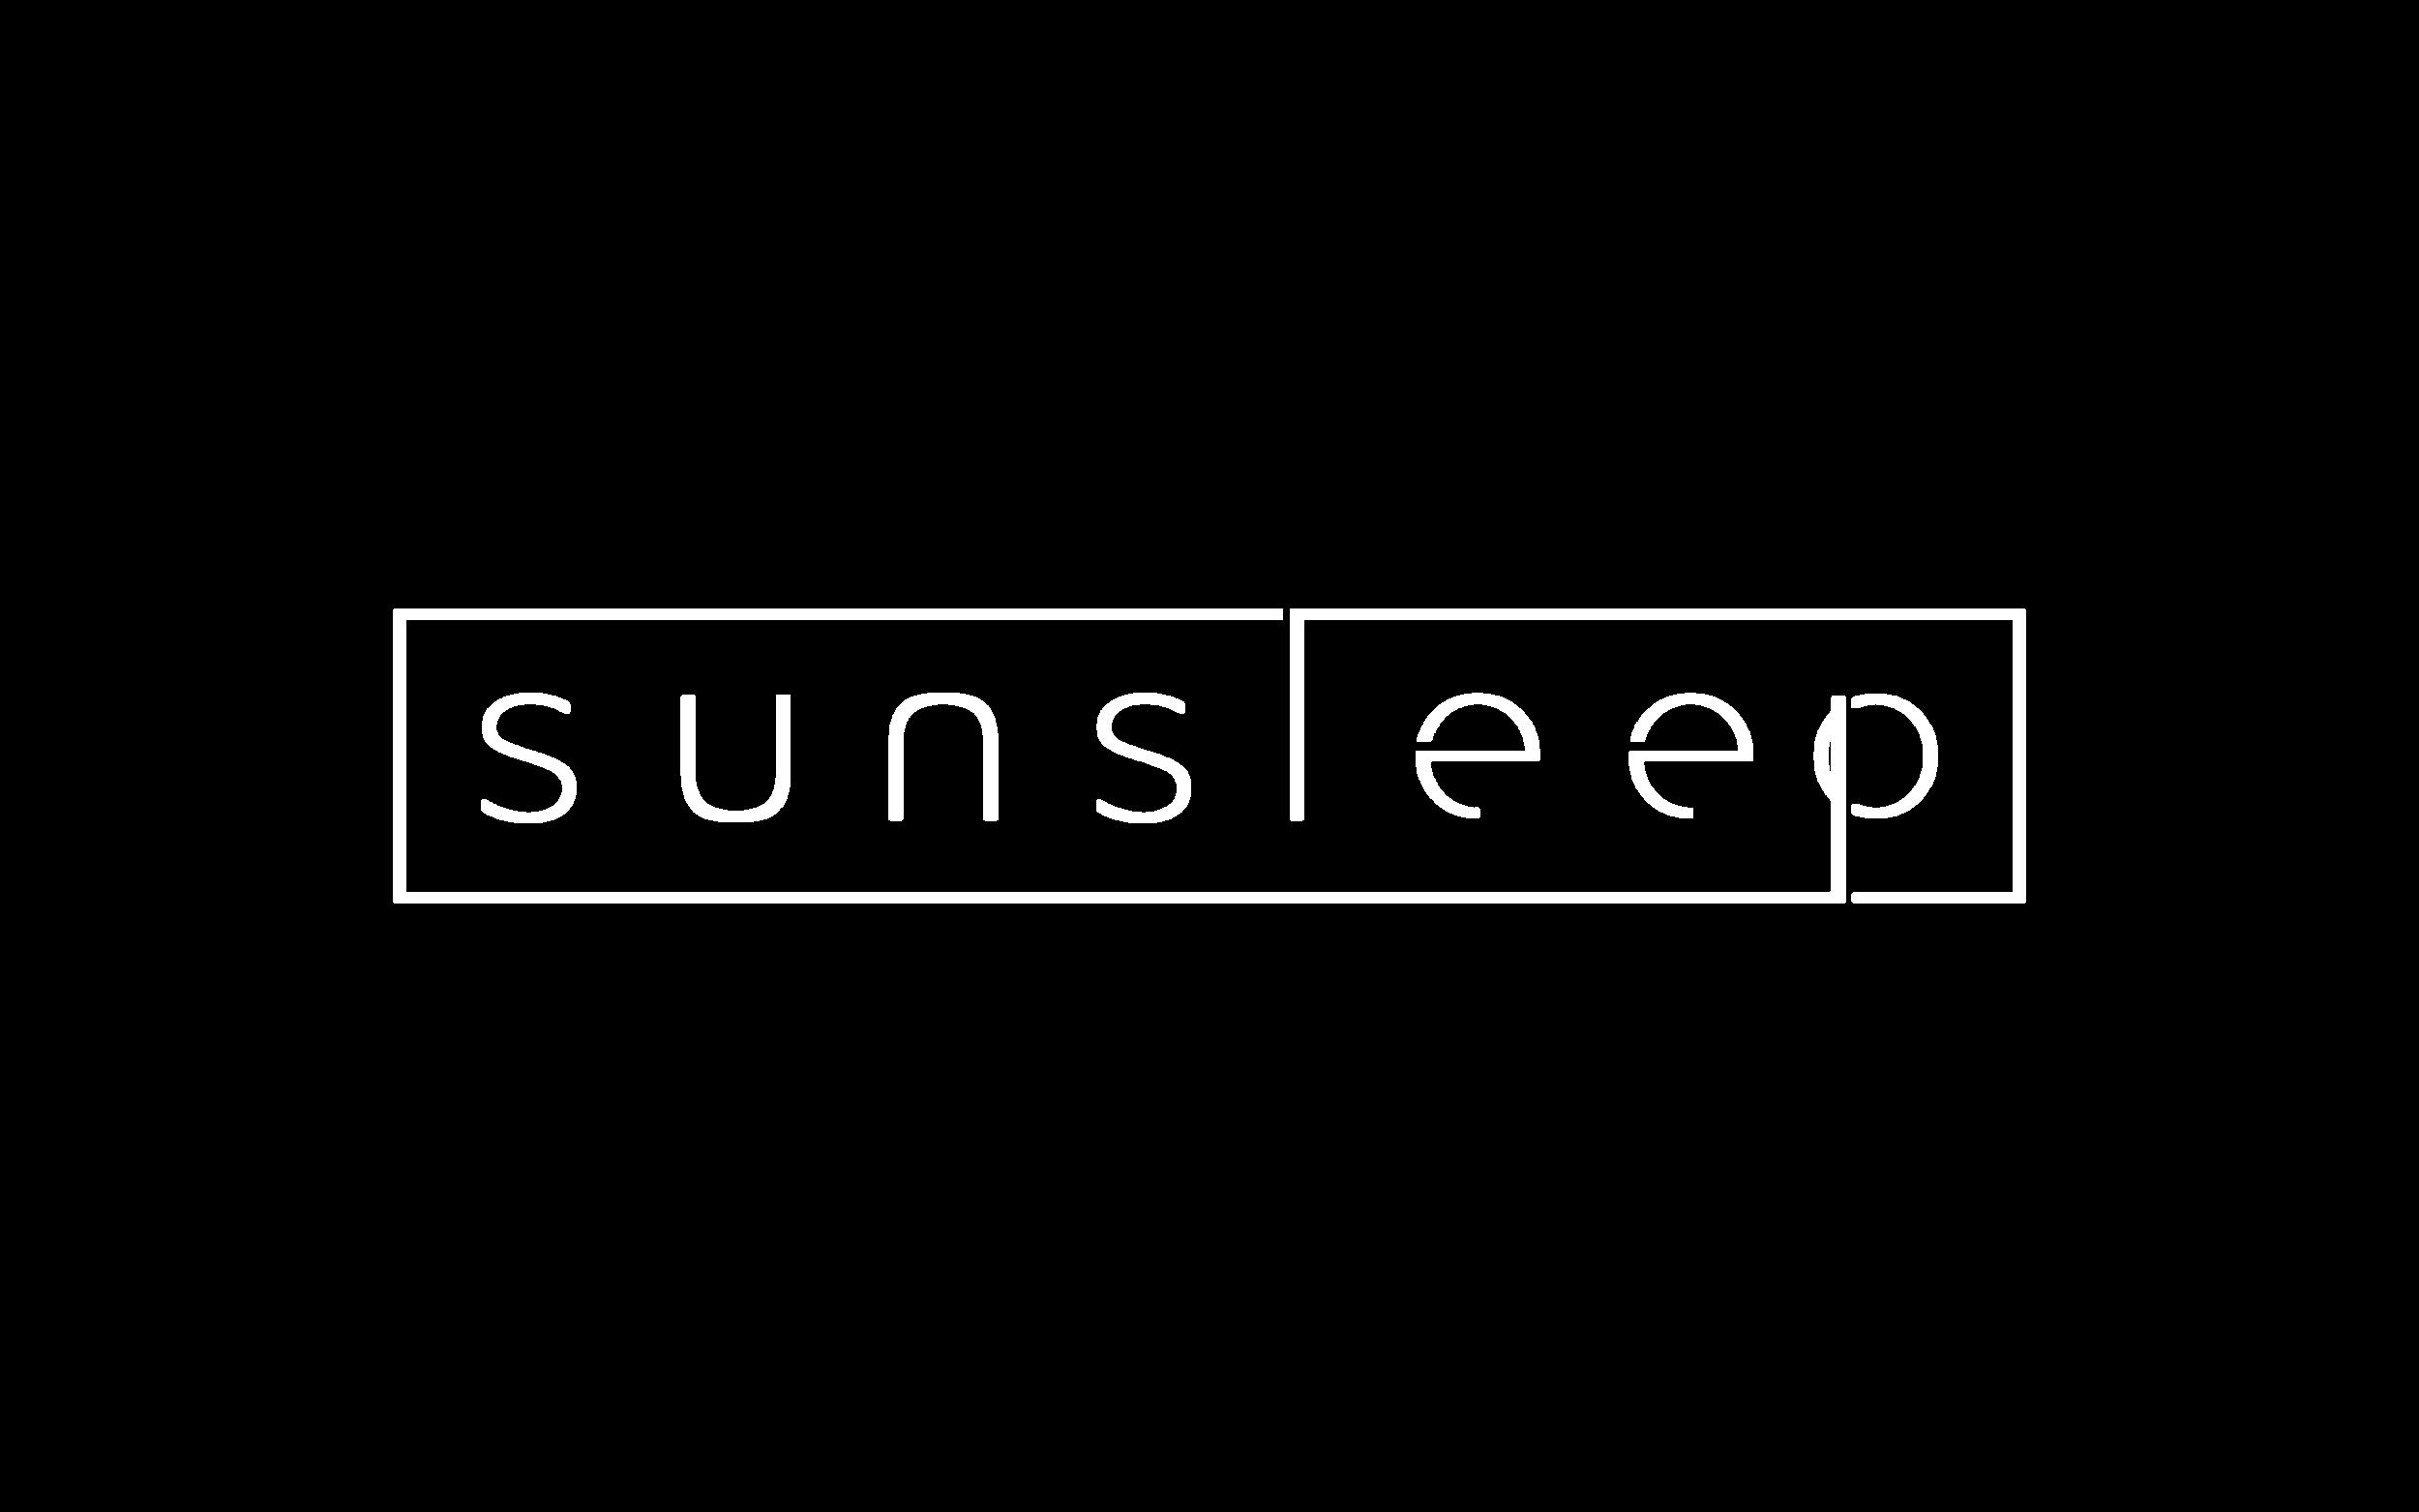 sunsleepboxwhite (2) (3).png